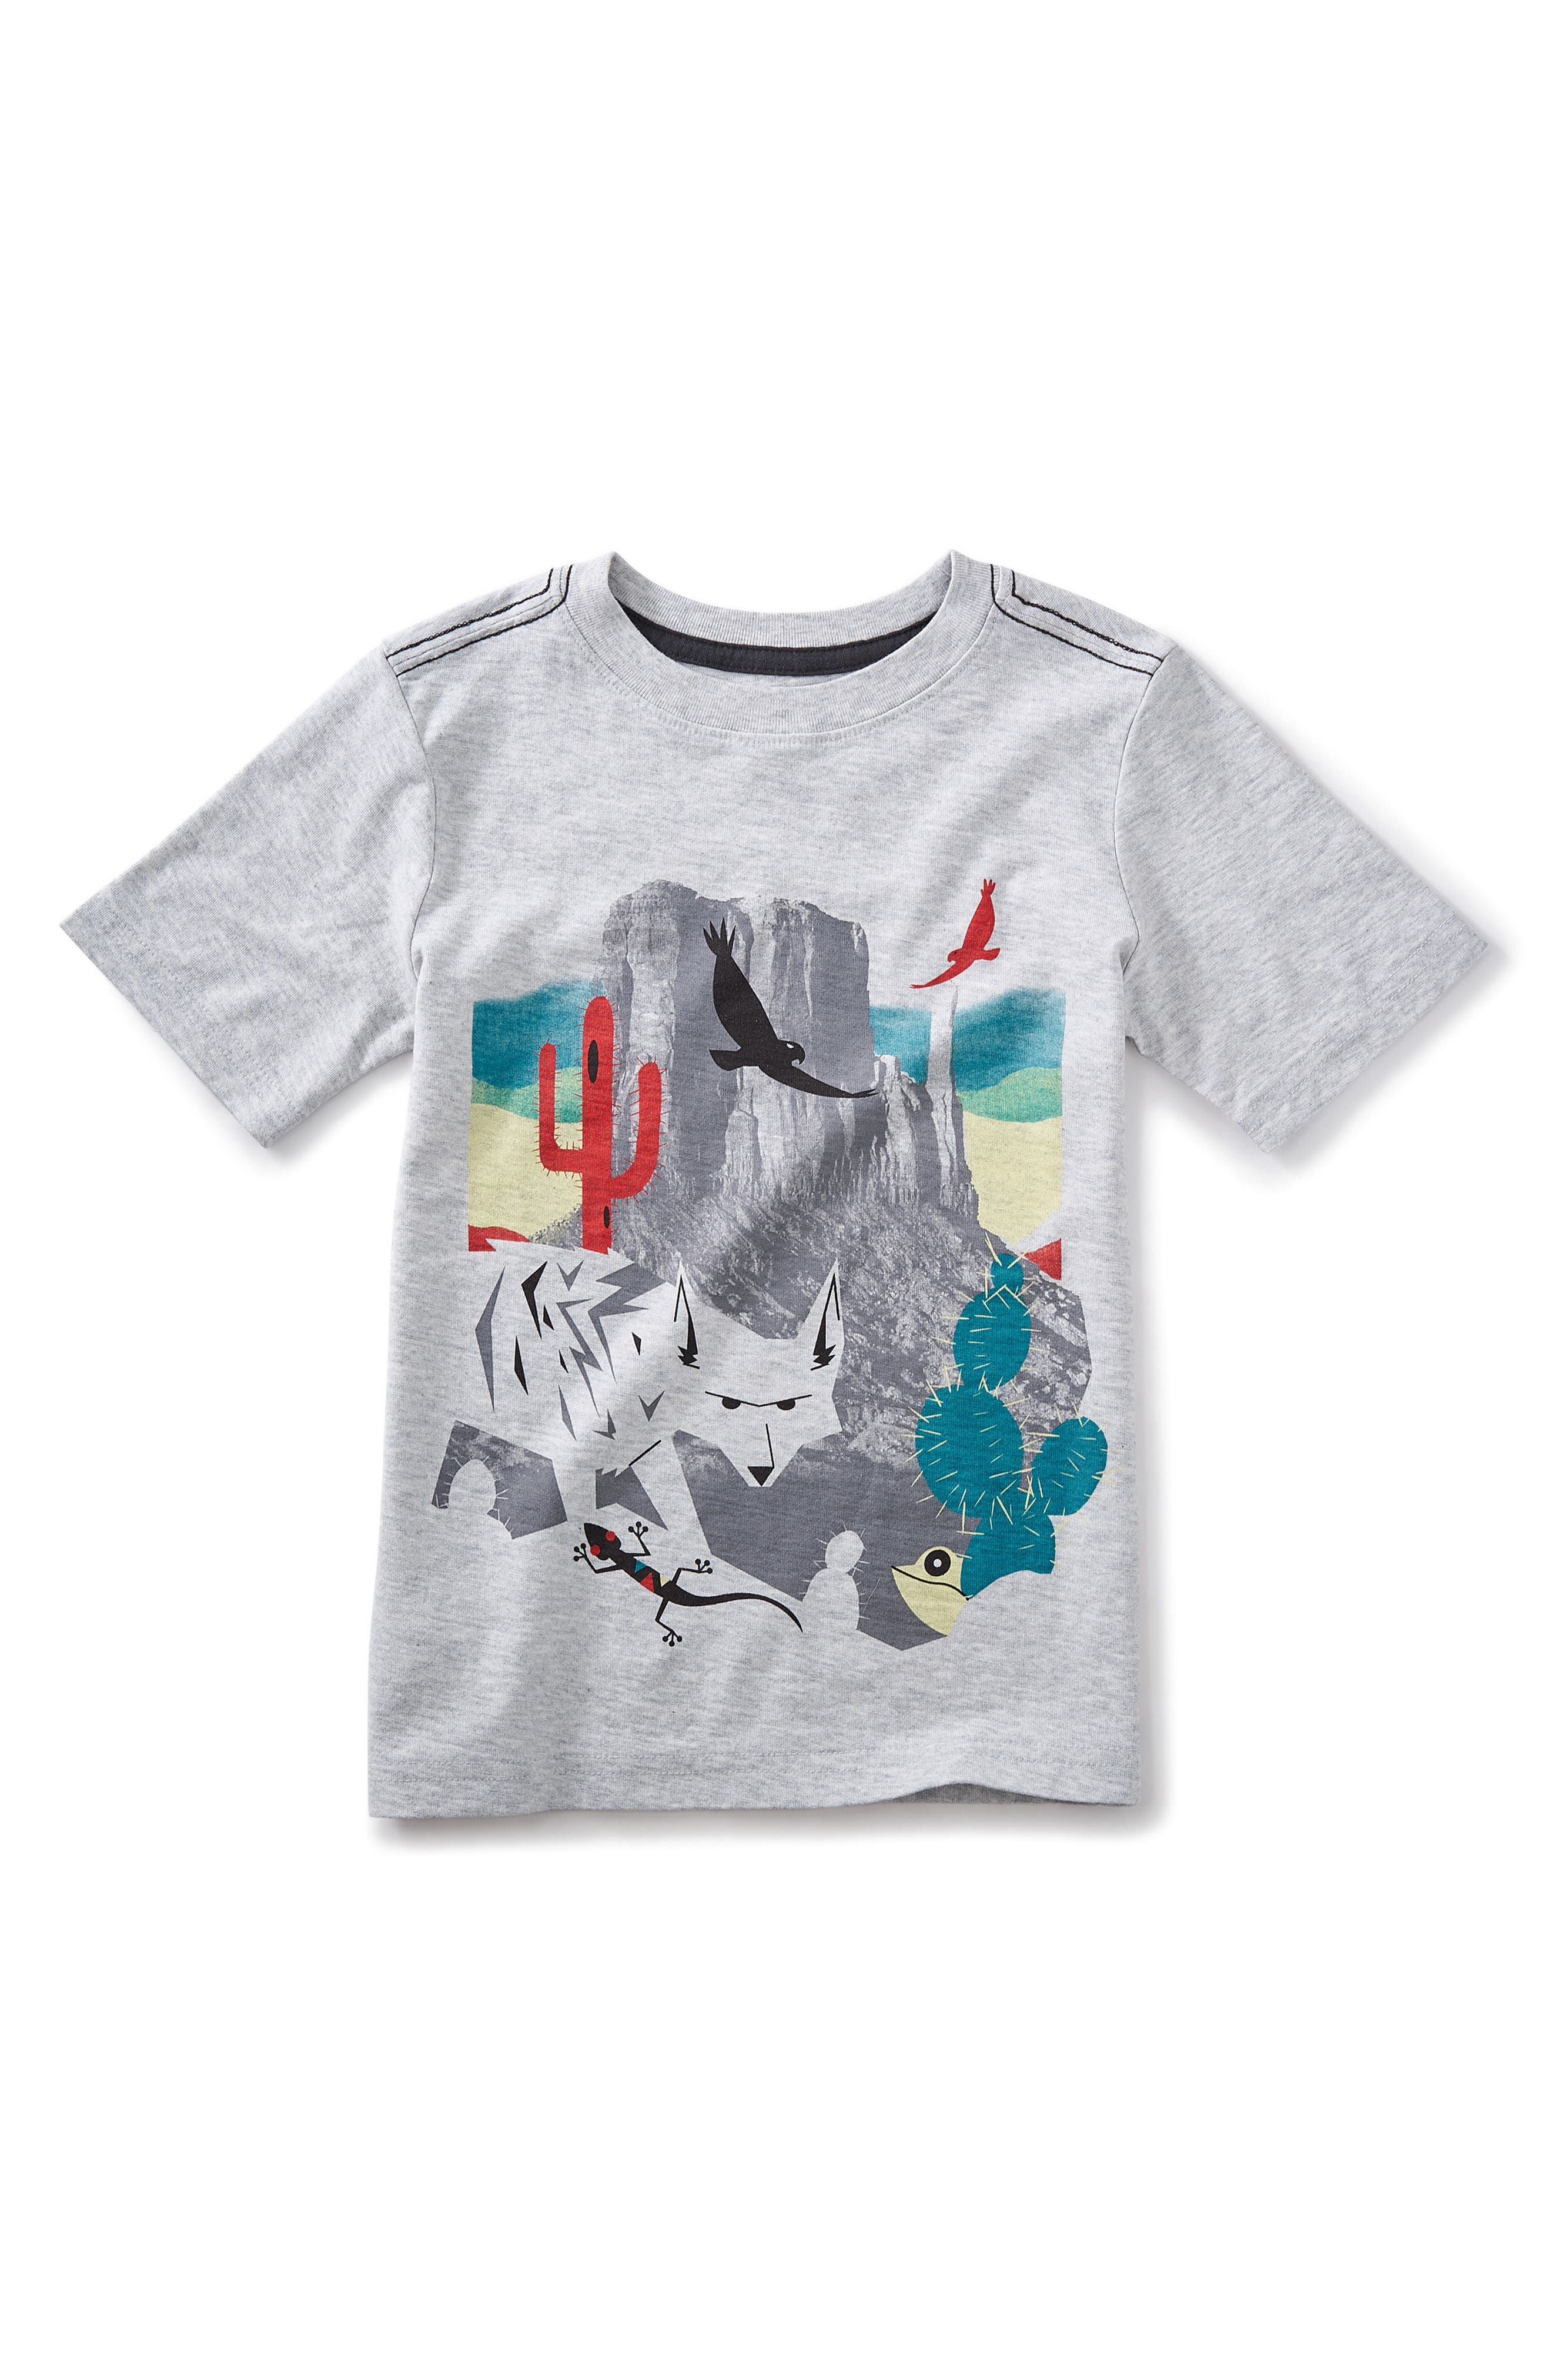 Tea Collection Canyon Lands Graphic T-Shirt (Toddler Boys, Little Boys & Big Boys)